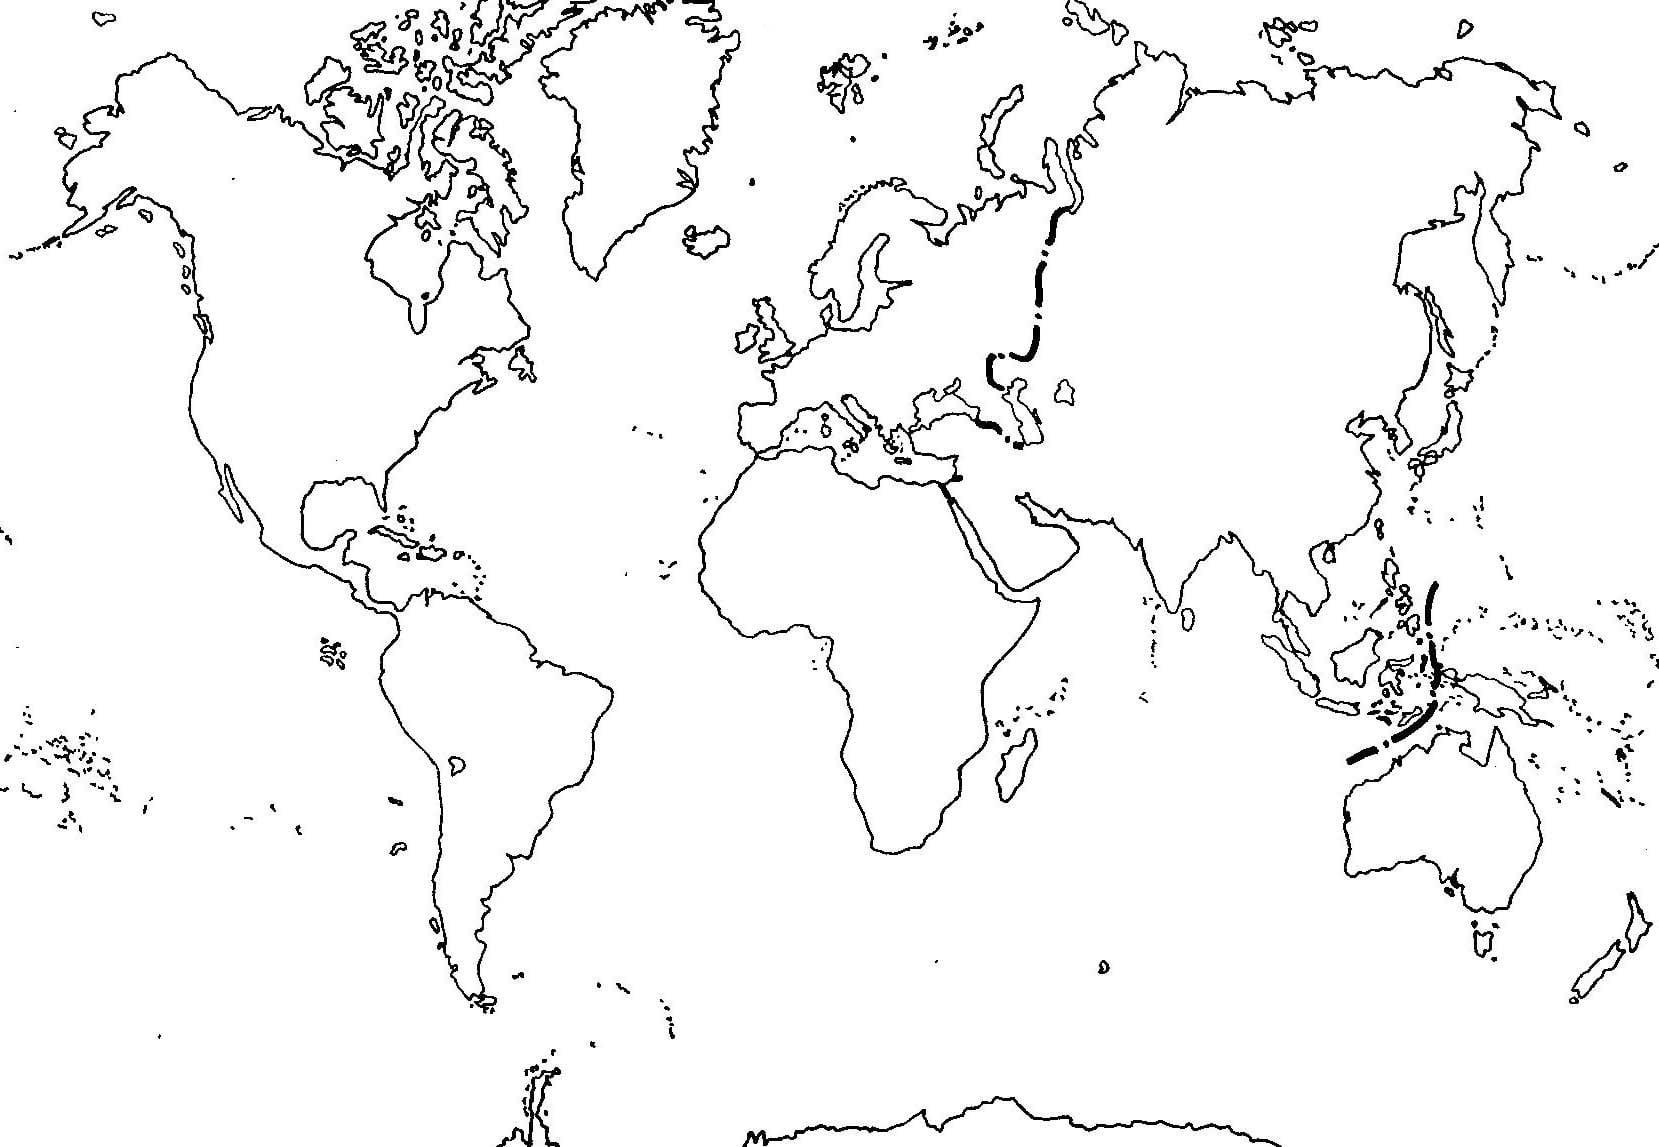 Mapa Mundi Para Colorear Related Keywords & Suggestions